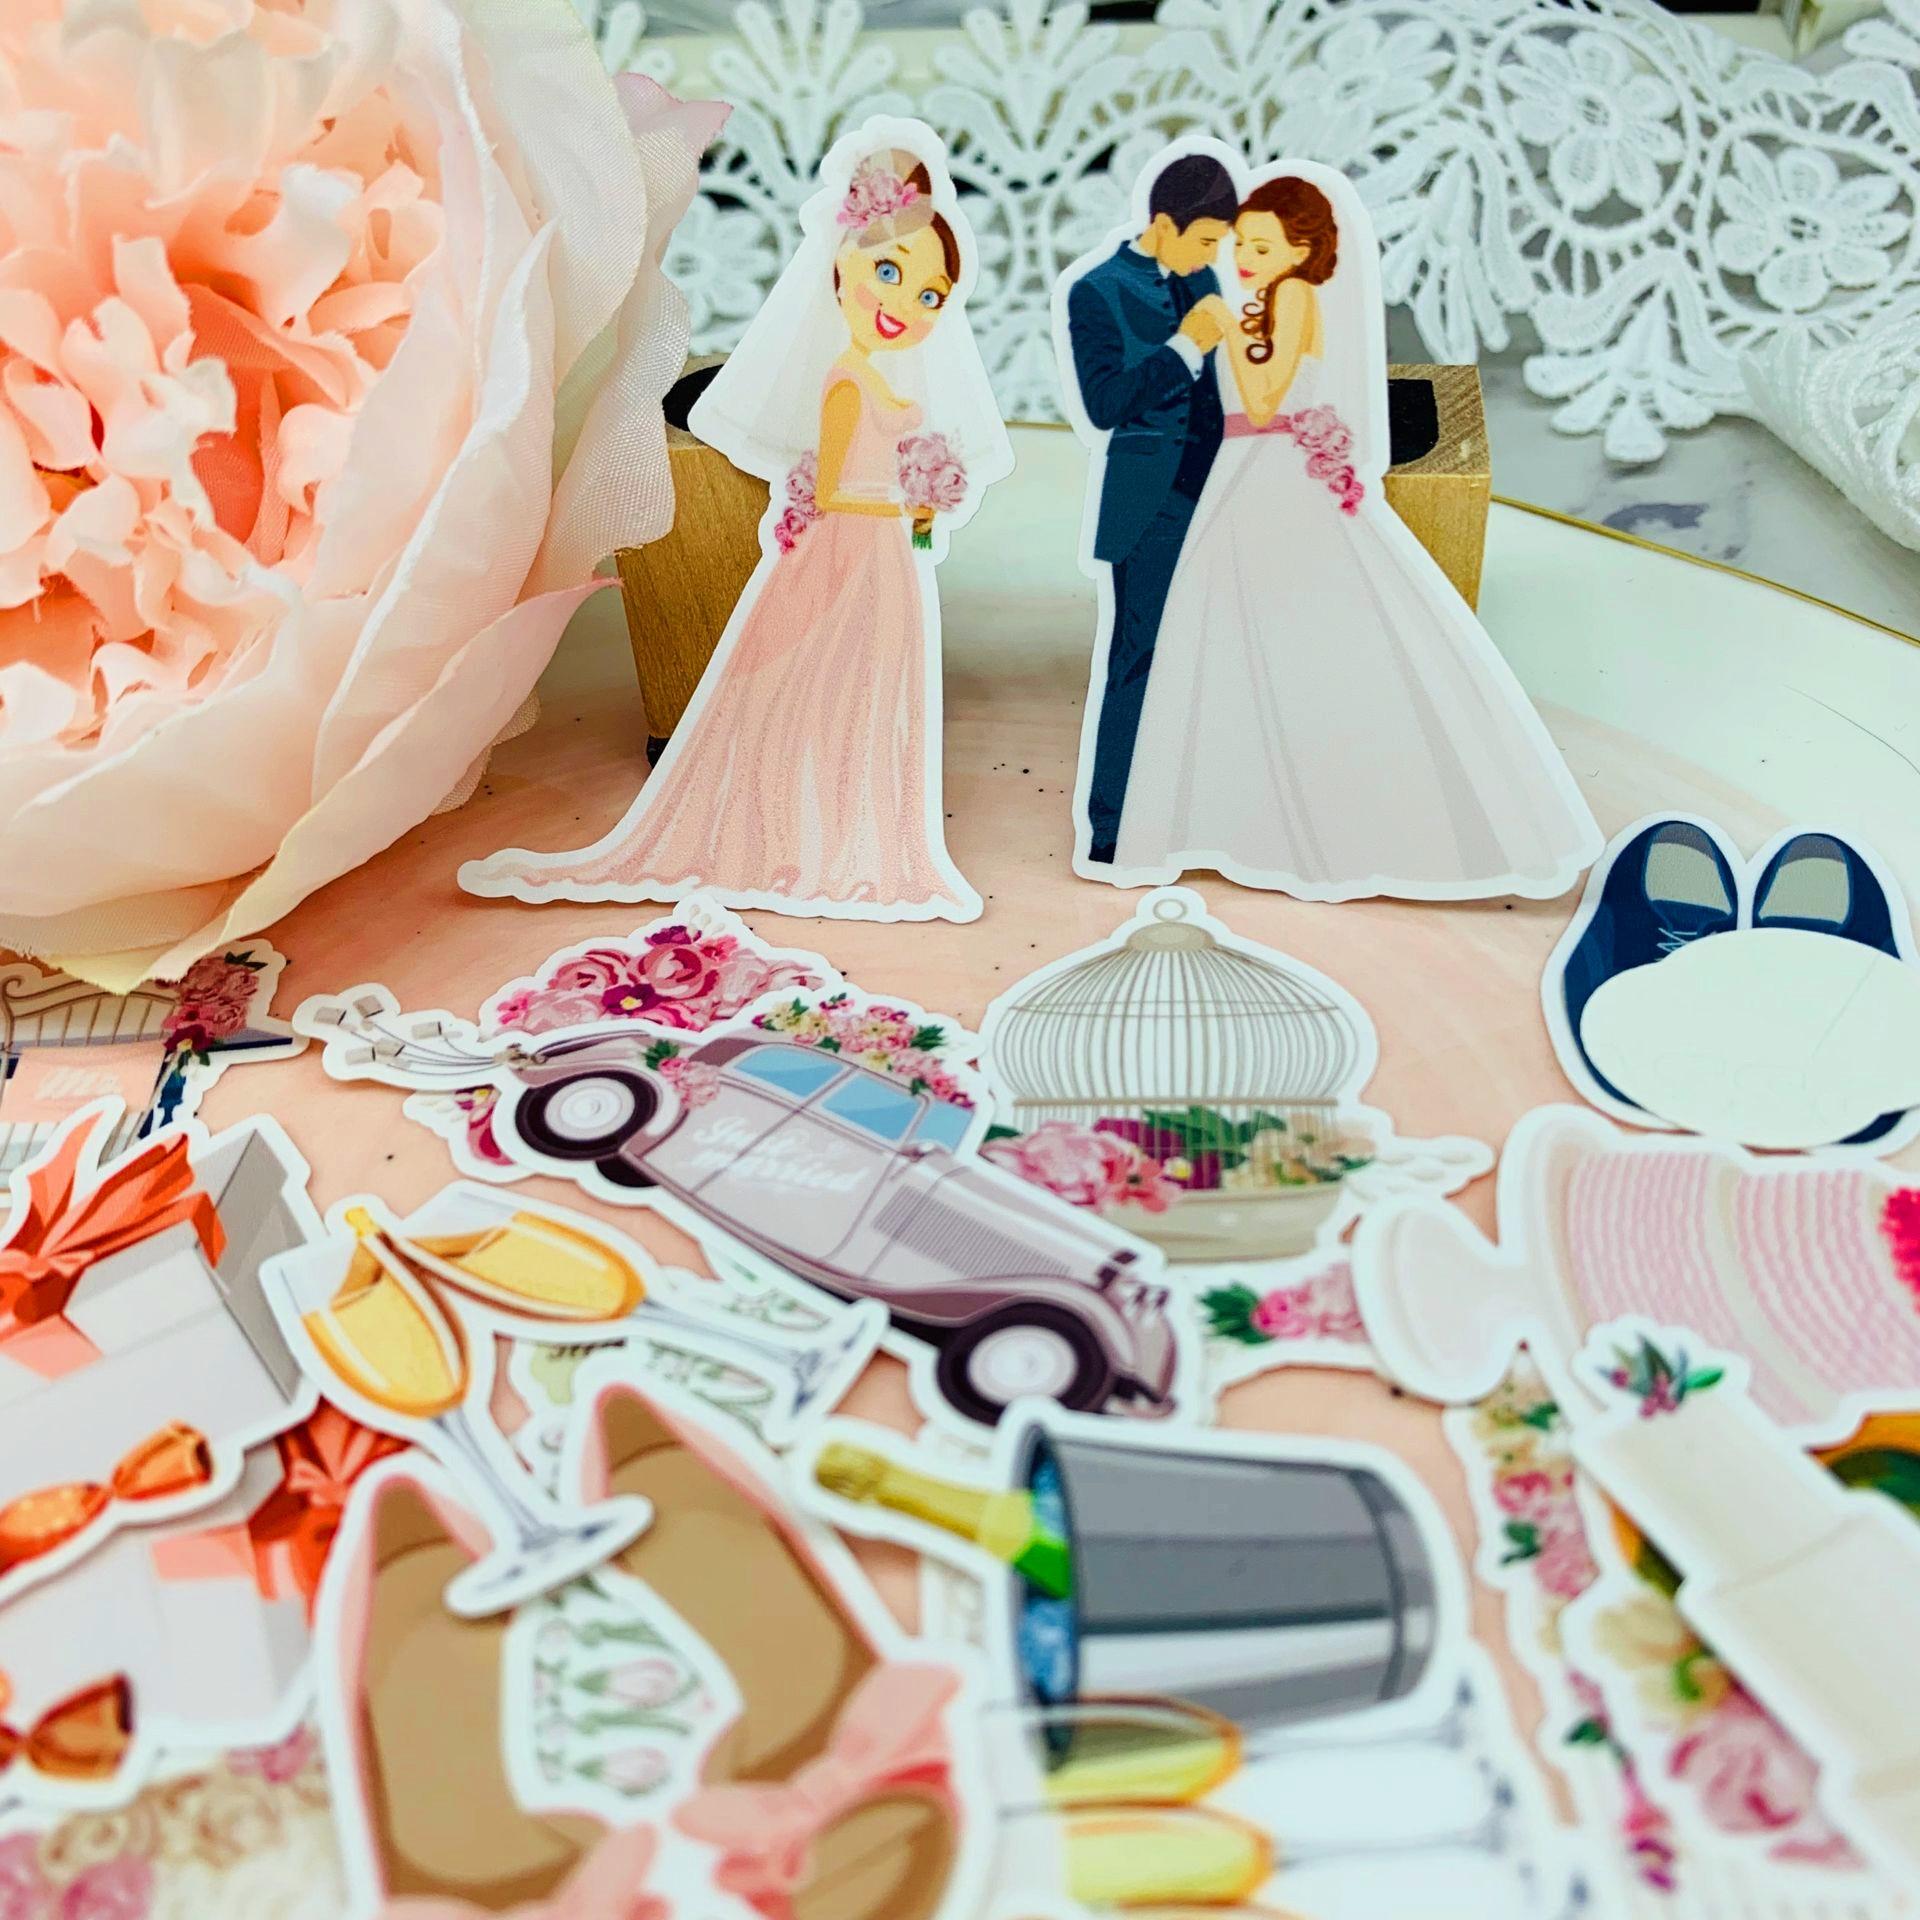 Paquete de 30 unidades de pegatinas de amantes para boda, álbum de recortes para manualidades DIY, diario, diario, pegatinas decorativas